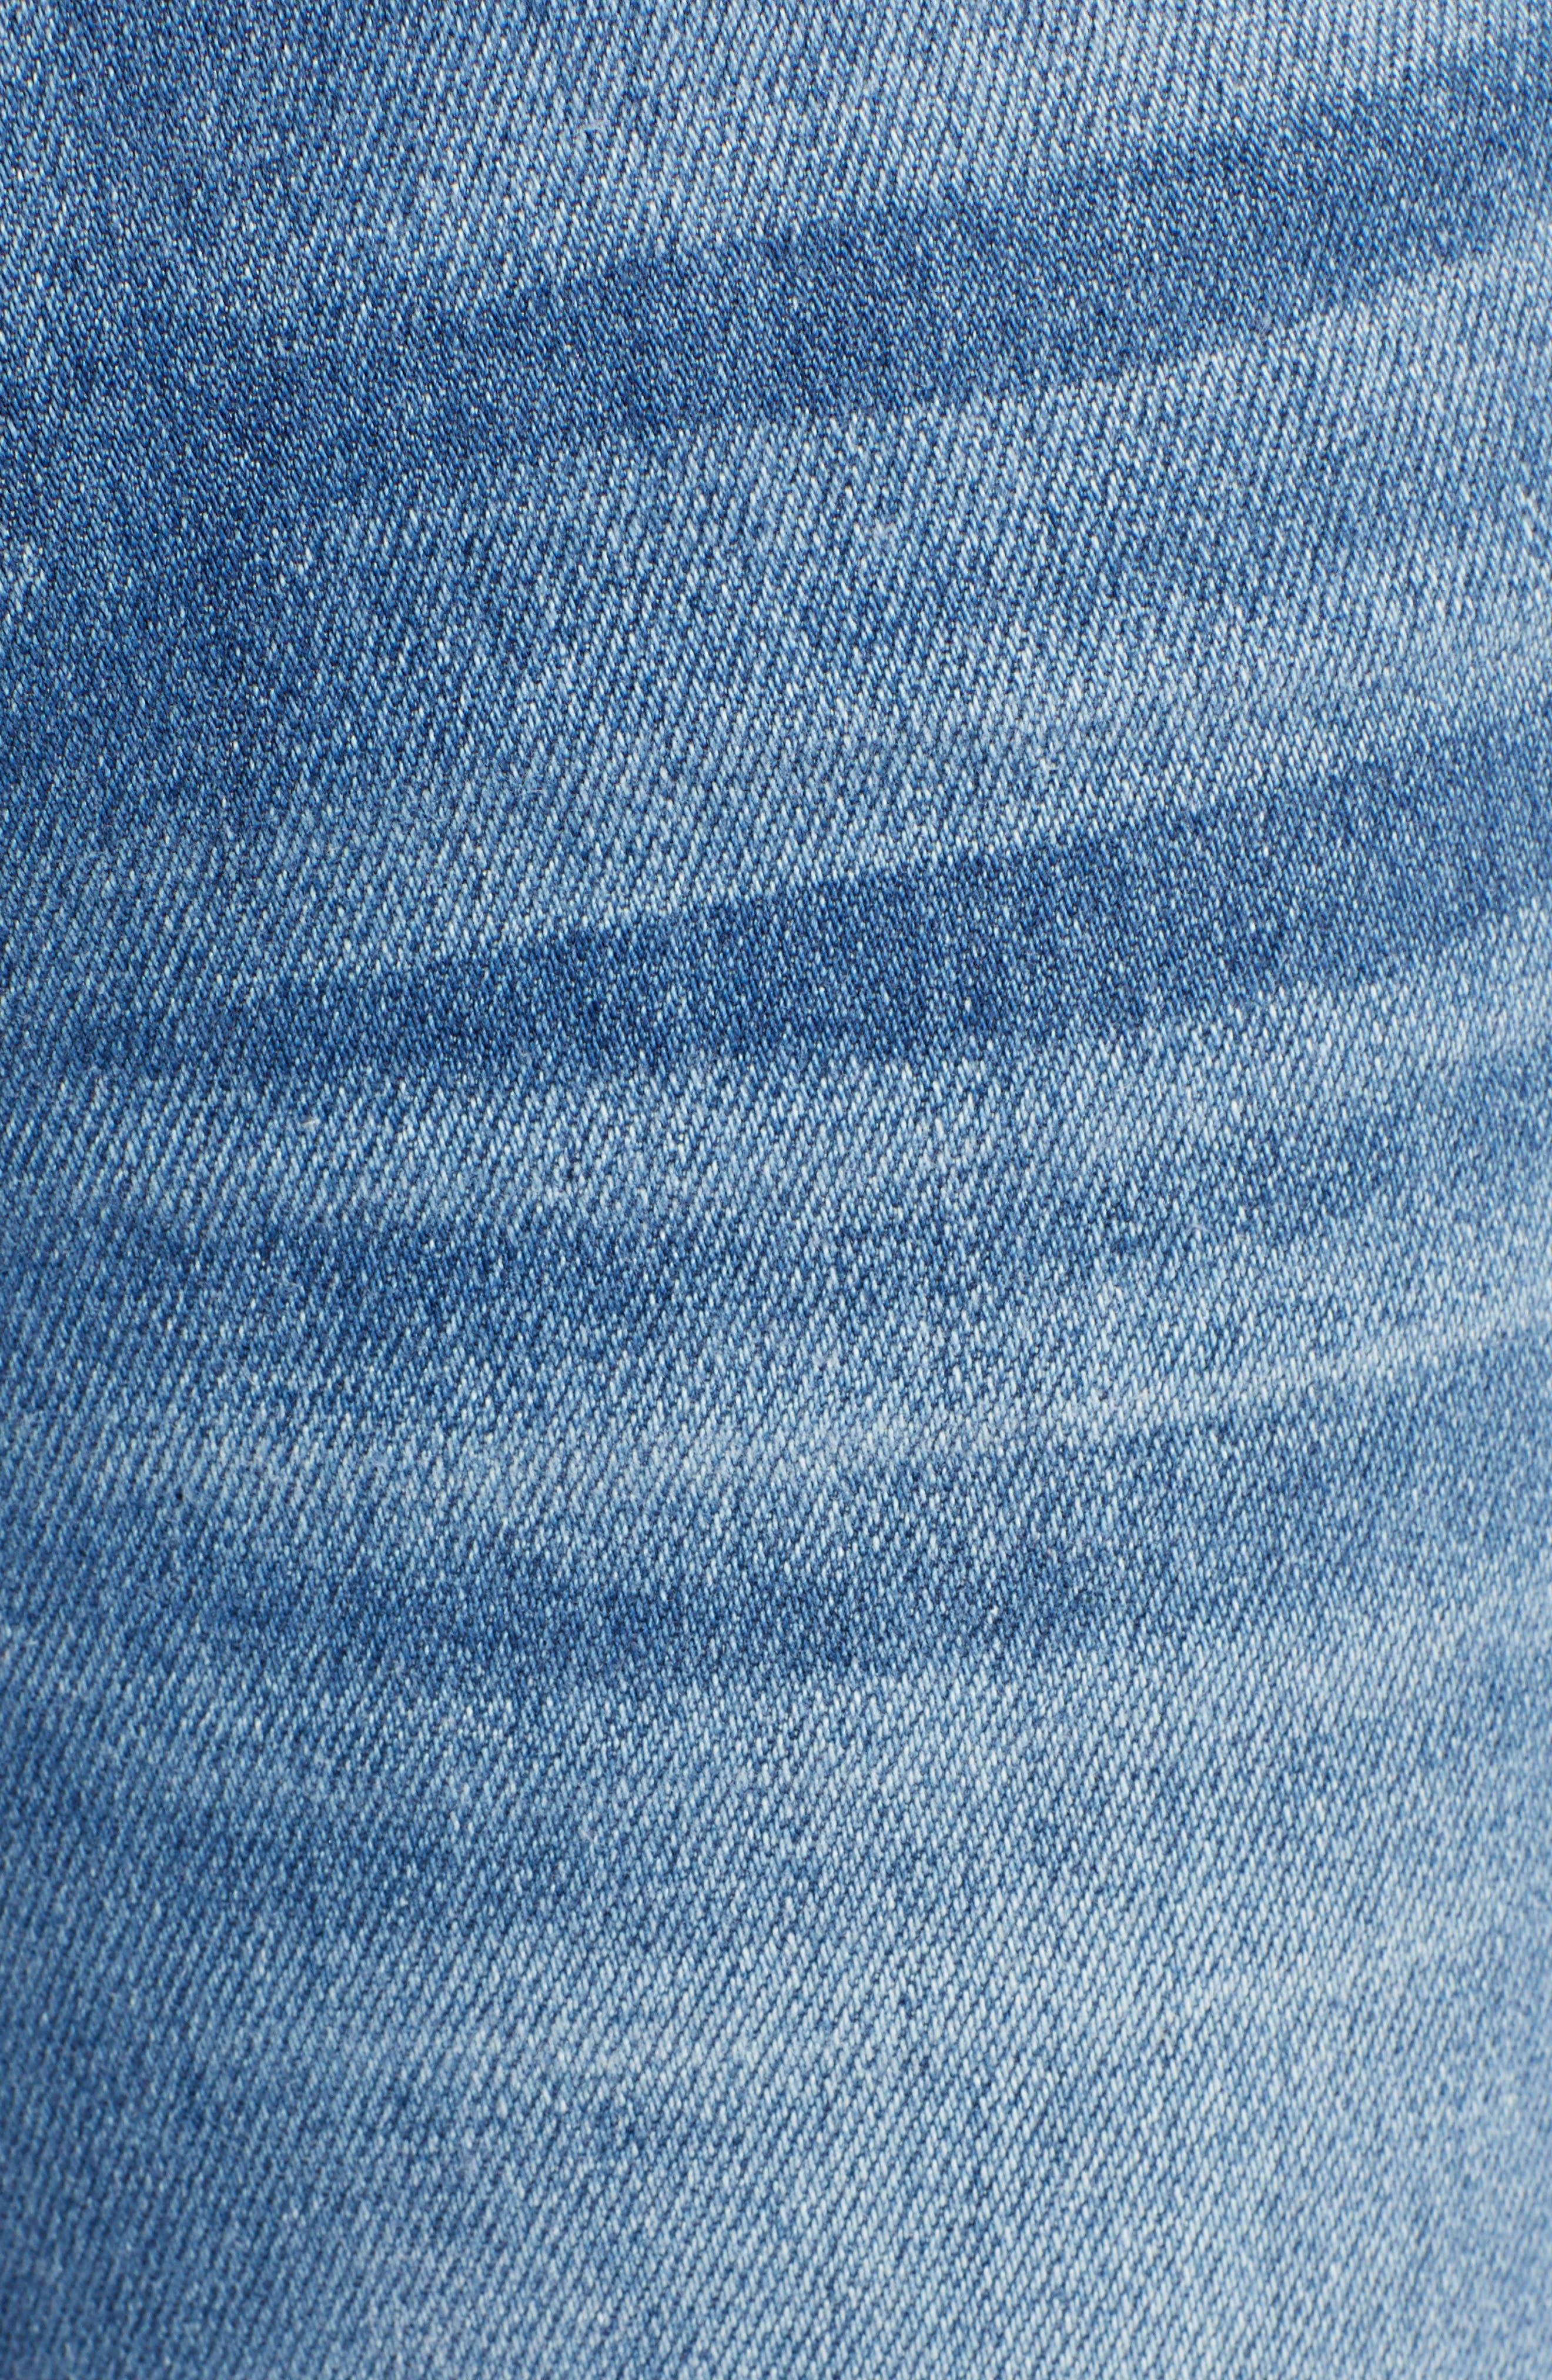 PAIGE,                             Verdugo Ultra Skinny Jeans,                             Alternate thumbnail 6, color,                             KAYSON DISTRESSED